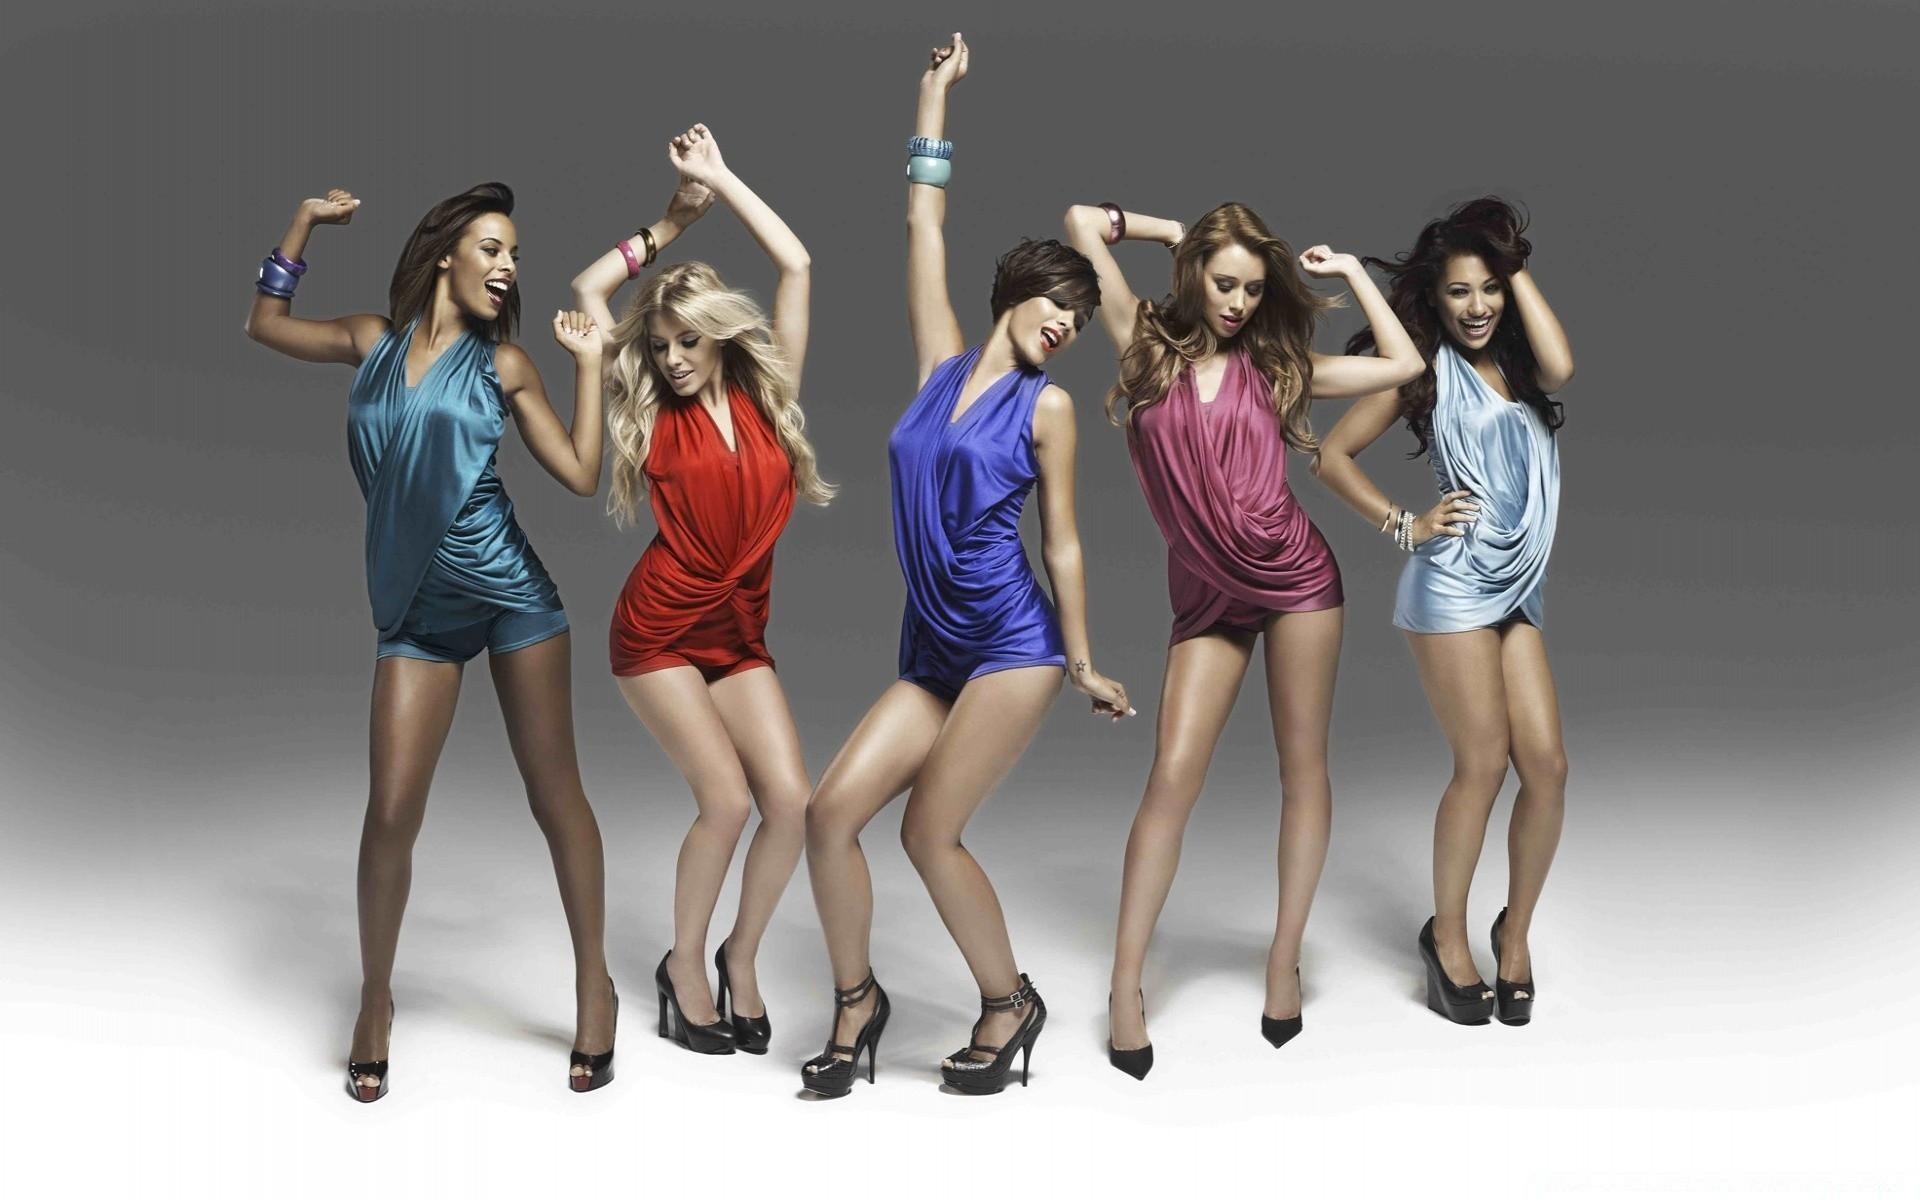 Girl loses clothing party, leonardo corredor nudo